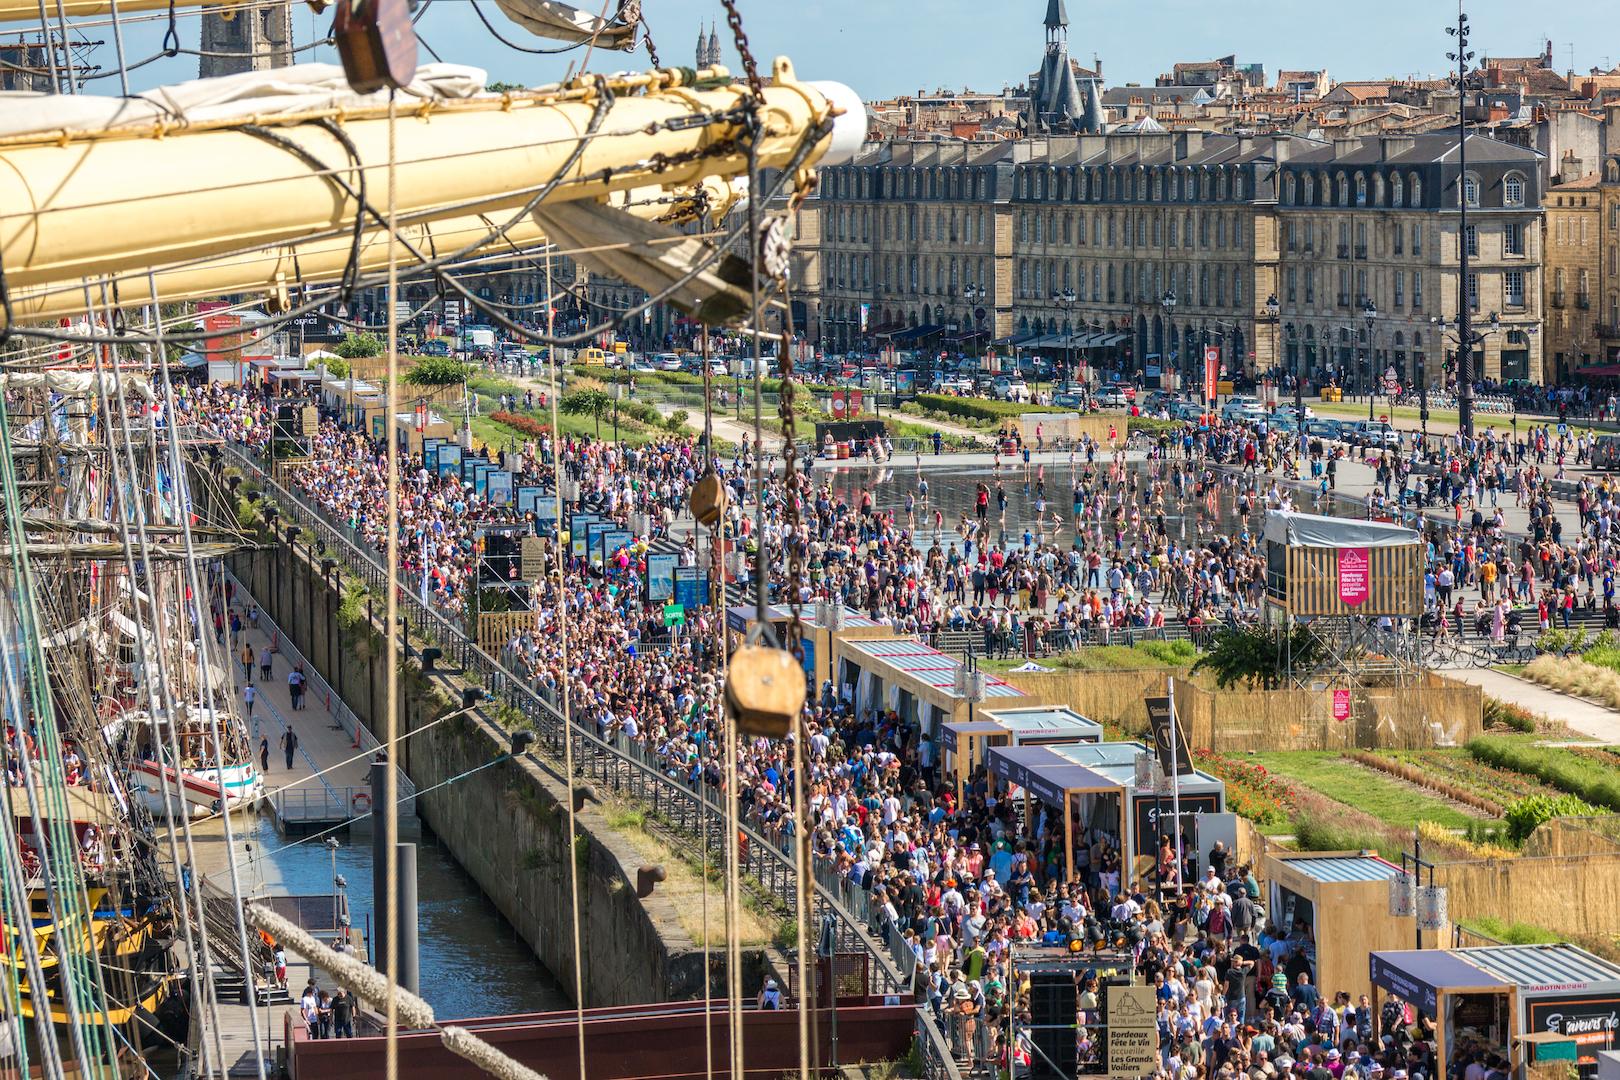 Crowds from the mast of Kruzenshtern